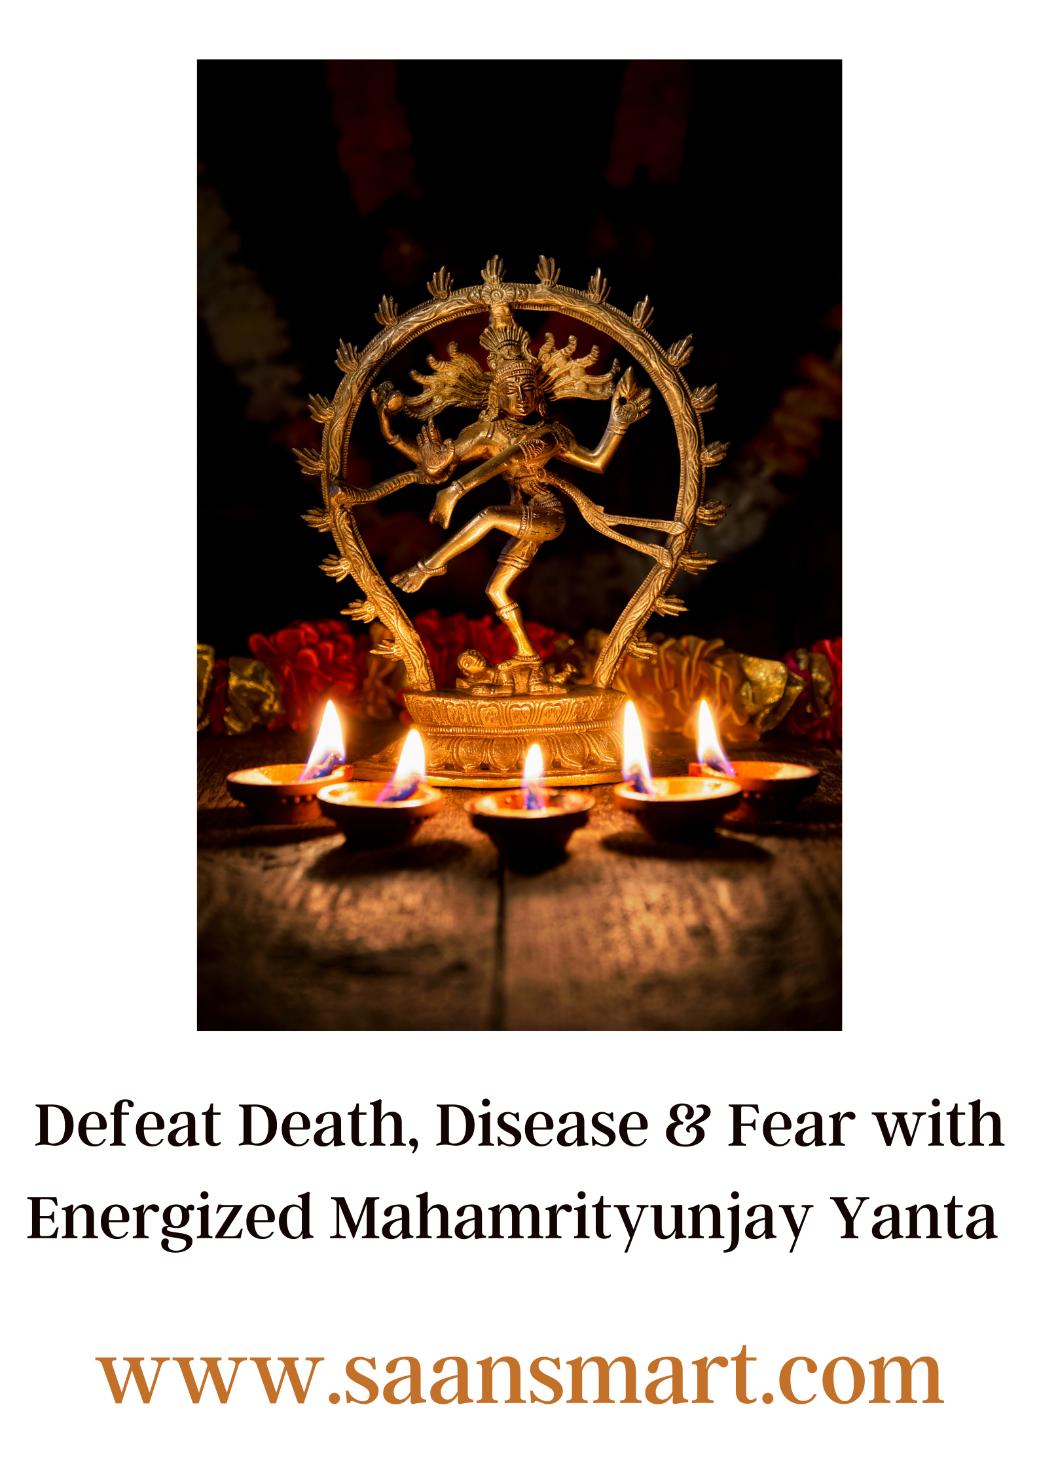 Shri Mahamrityunjay Yantra: Tap into Lord Shiva's Grace